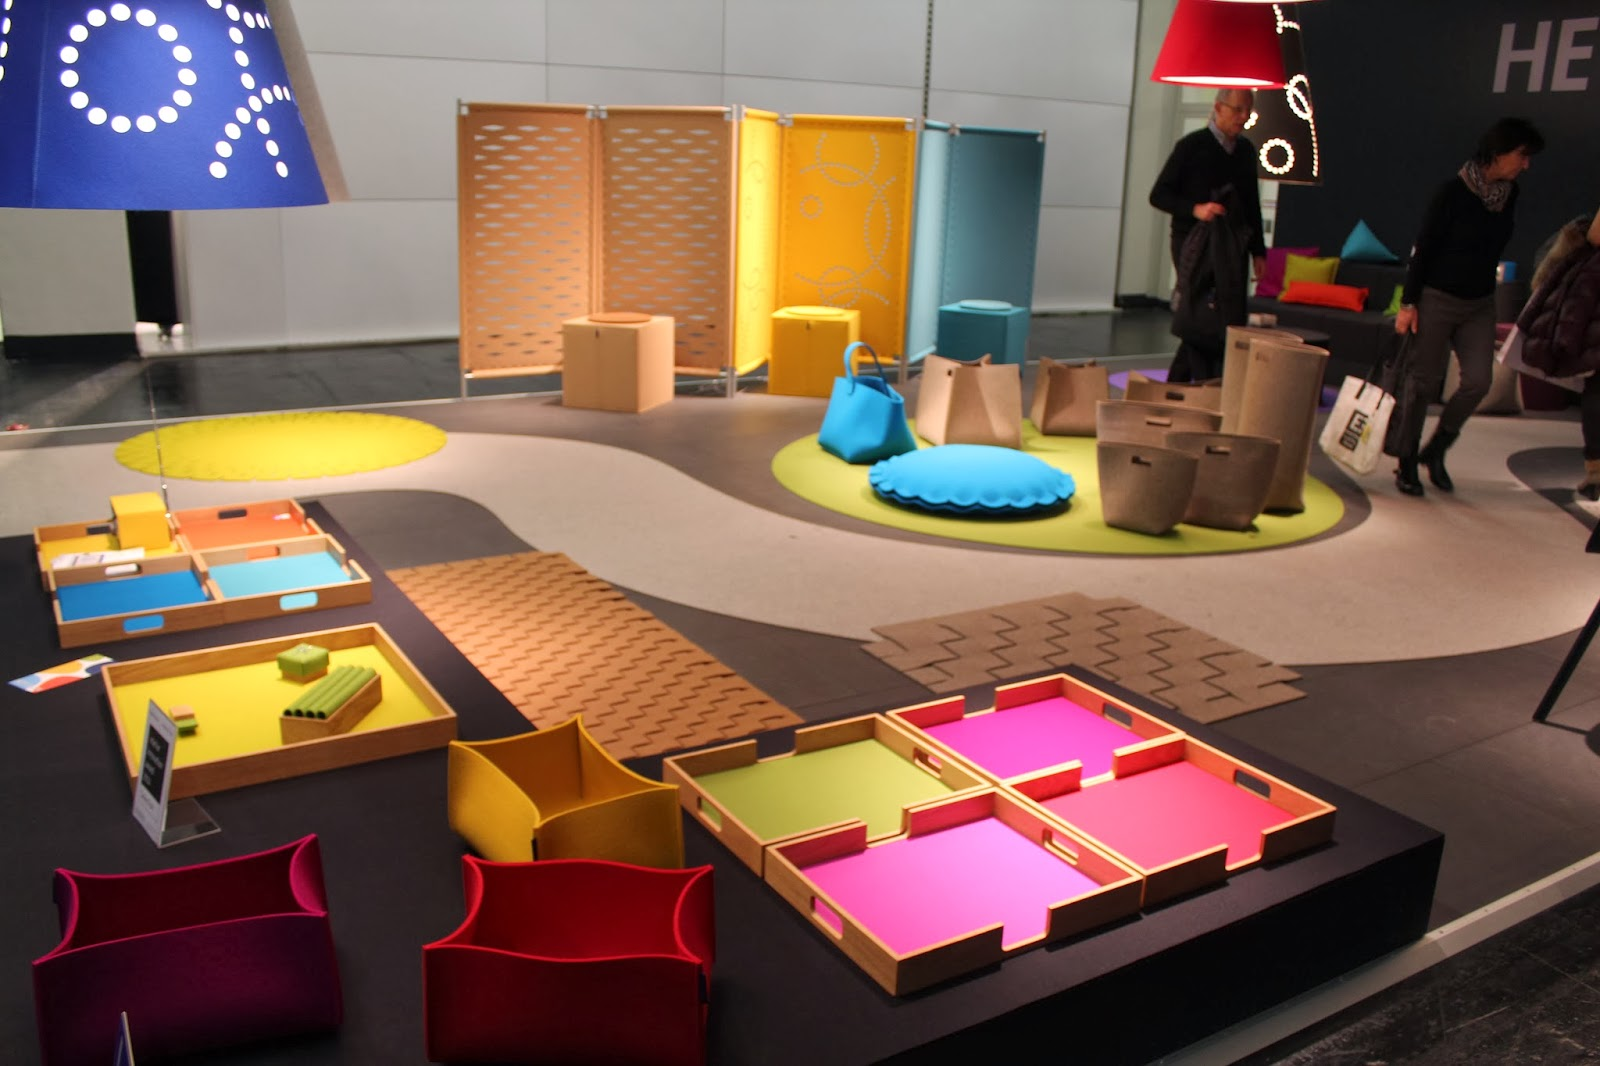 werk place imm cologne 2014 ich war dabei. Black Bedroom Furniture Sets. Home Design Ideas